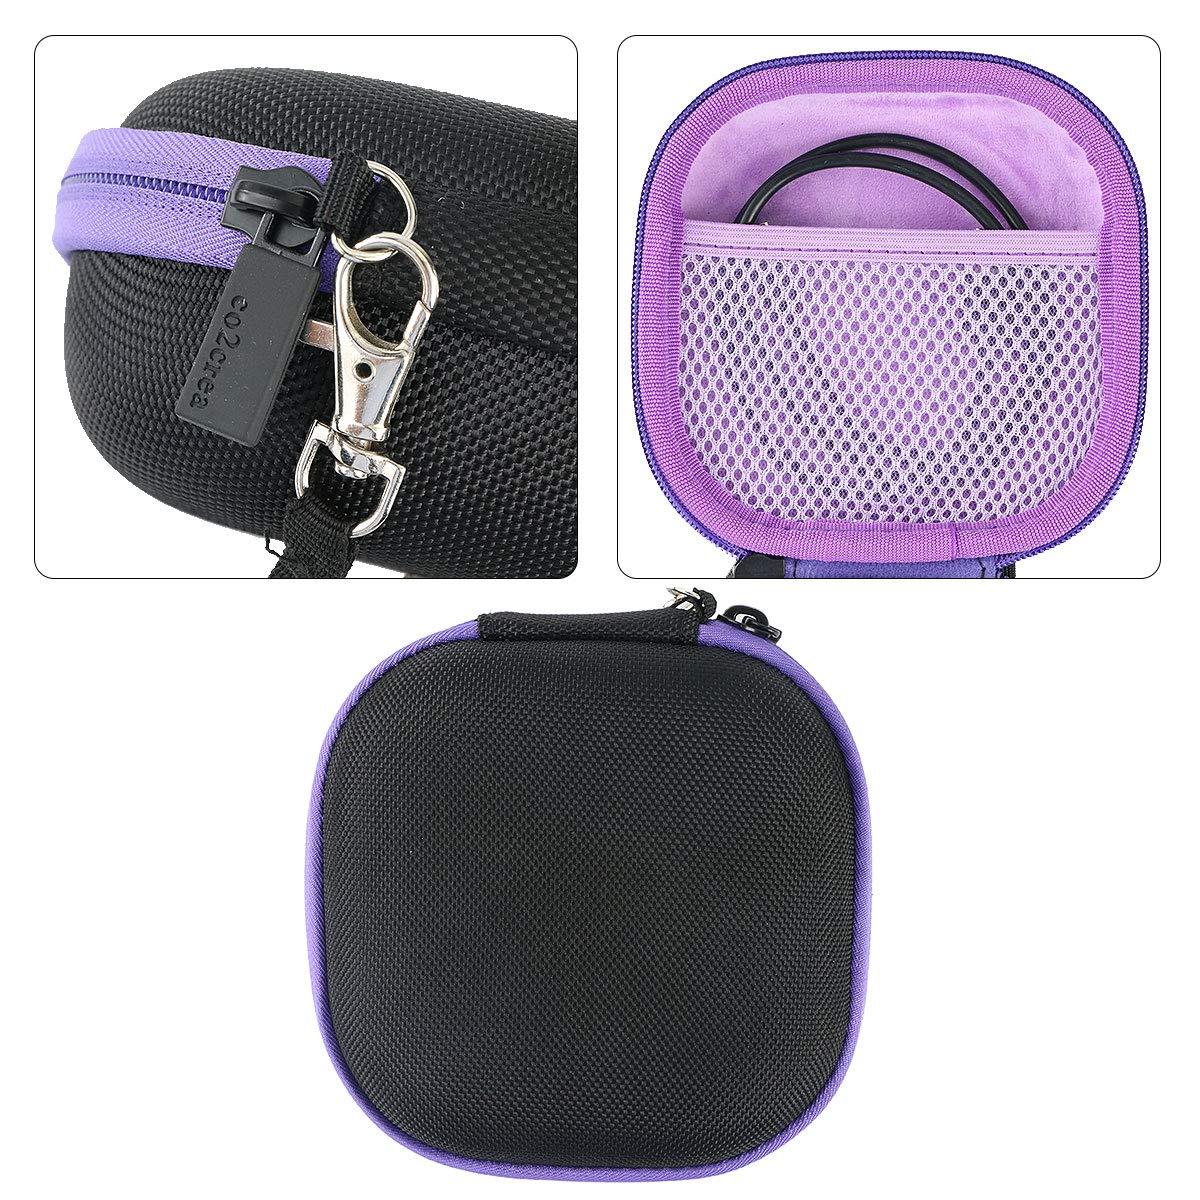 co2CREA storage carry travel hard case for LeapFrog Rockit Twist Kids Educational Toy external black,green zipper